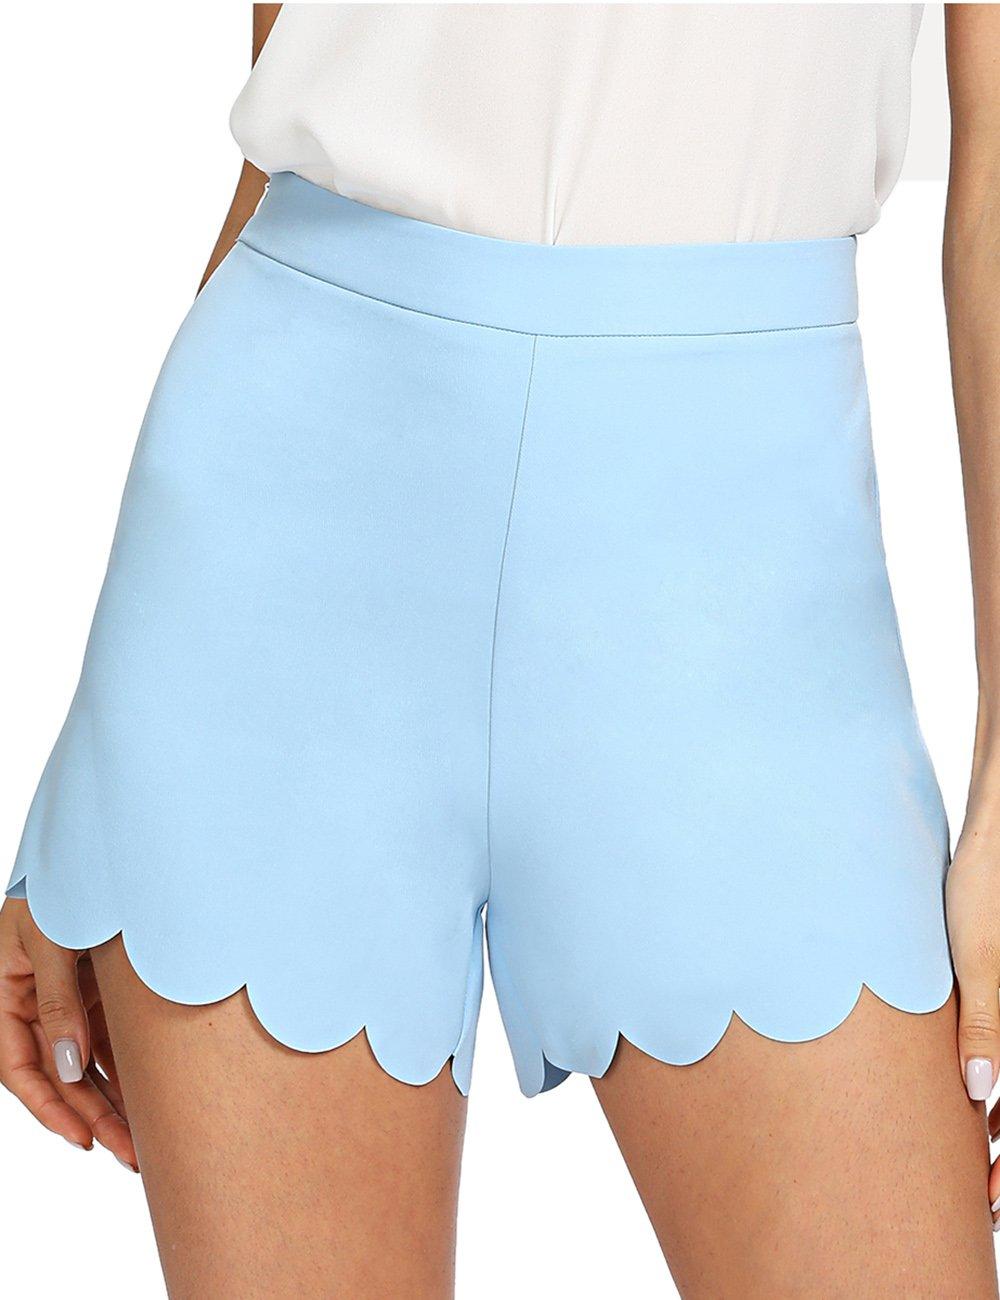 Romwe Women's Casual Scallop Hem Summer Walking Shorts Blue XS